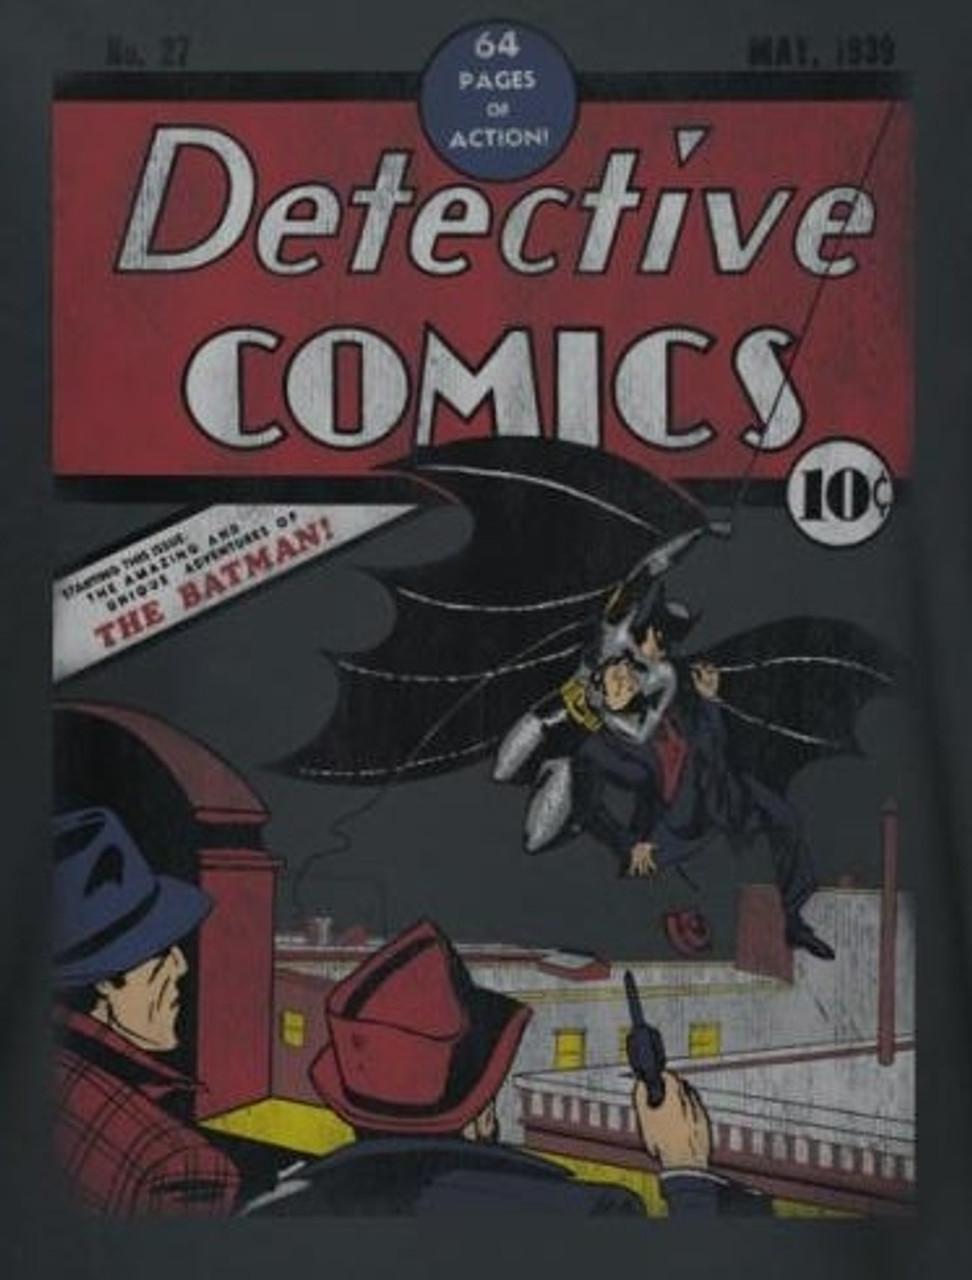 Batman DETECTIVE COMICS #27 Vintage Style Licensed Long Sleeve T-Shirt S-3XL